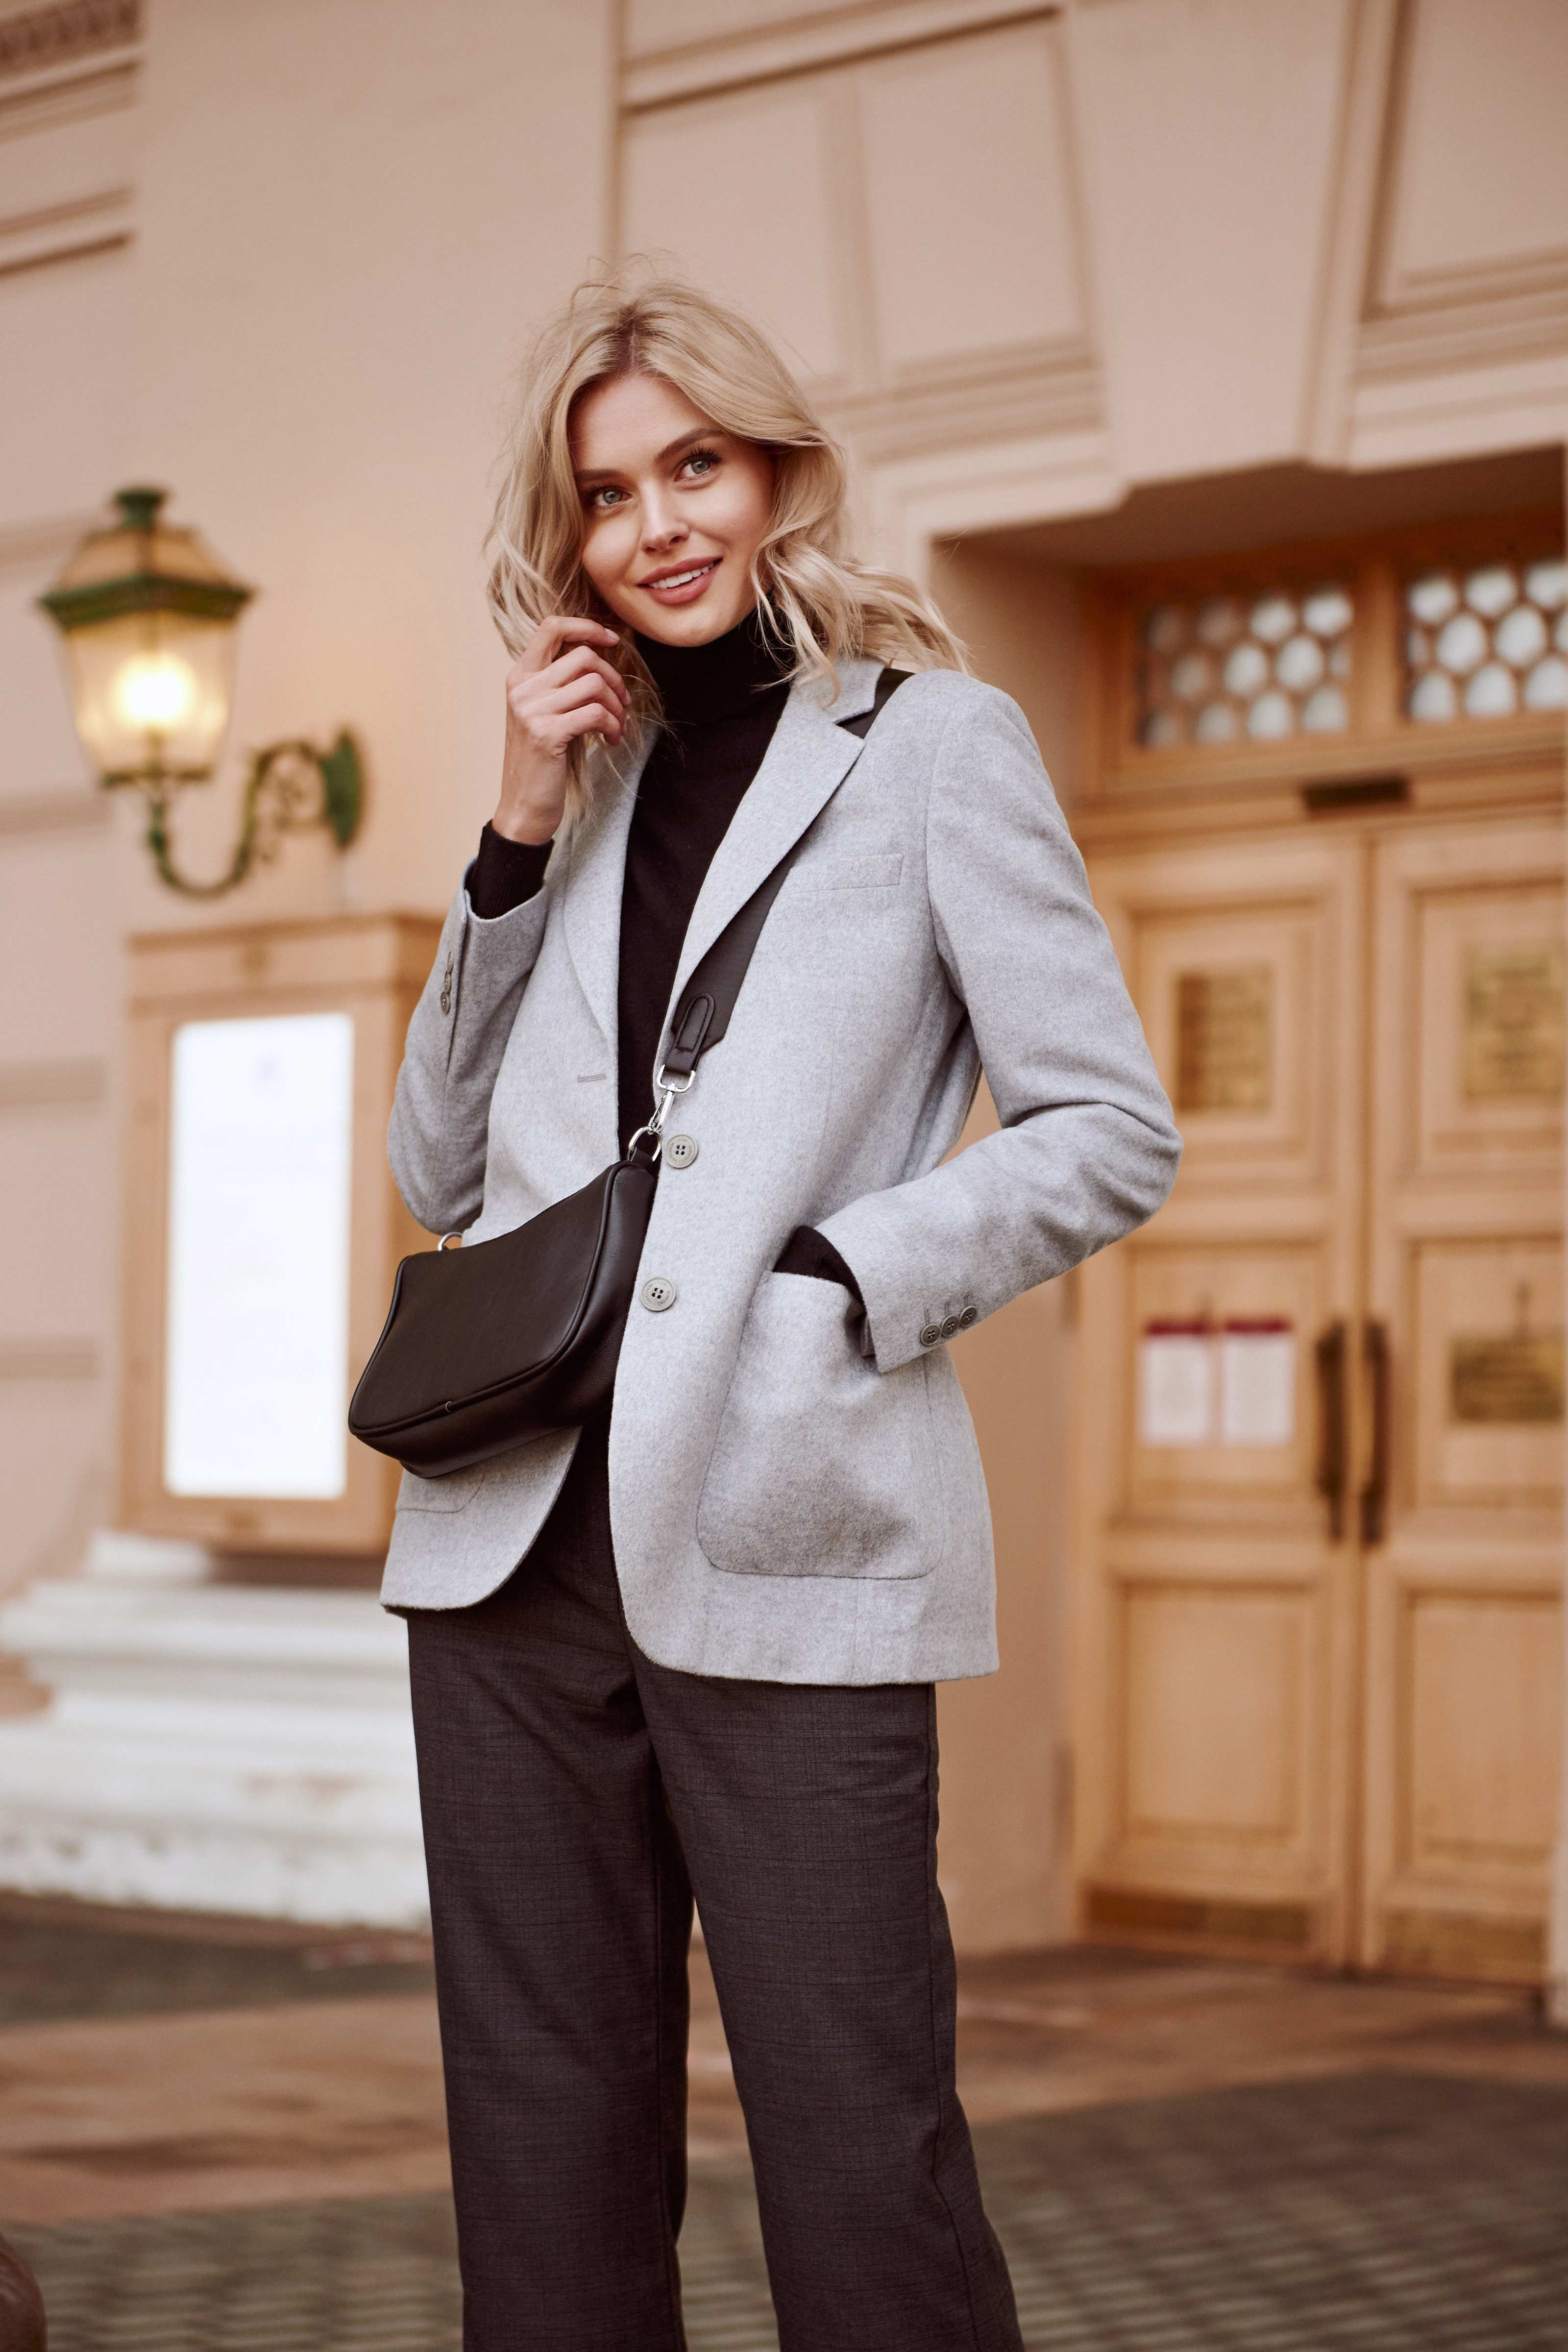 WB09 148 - Beautiful cashmere blazer+FREE cashmere scarf